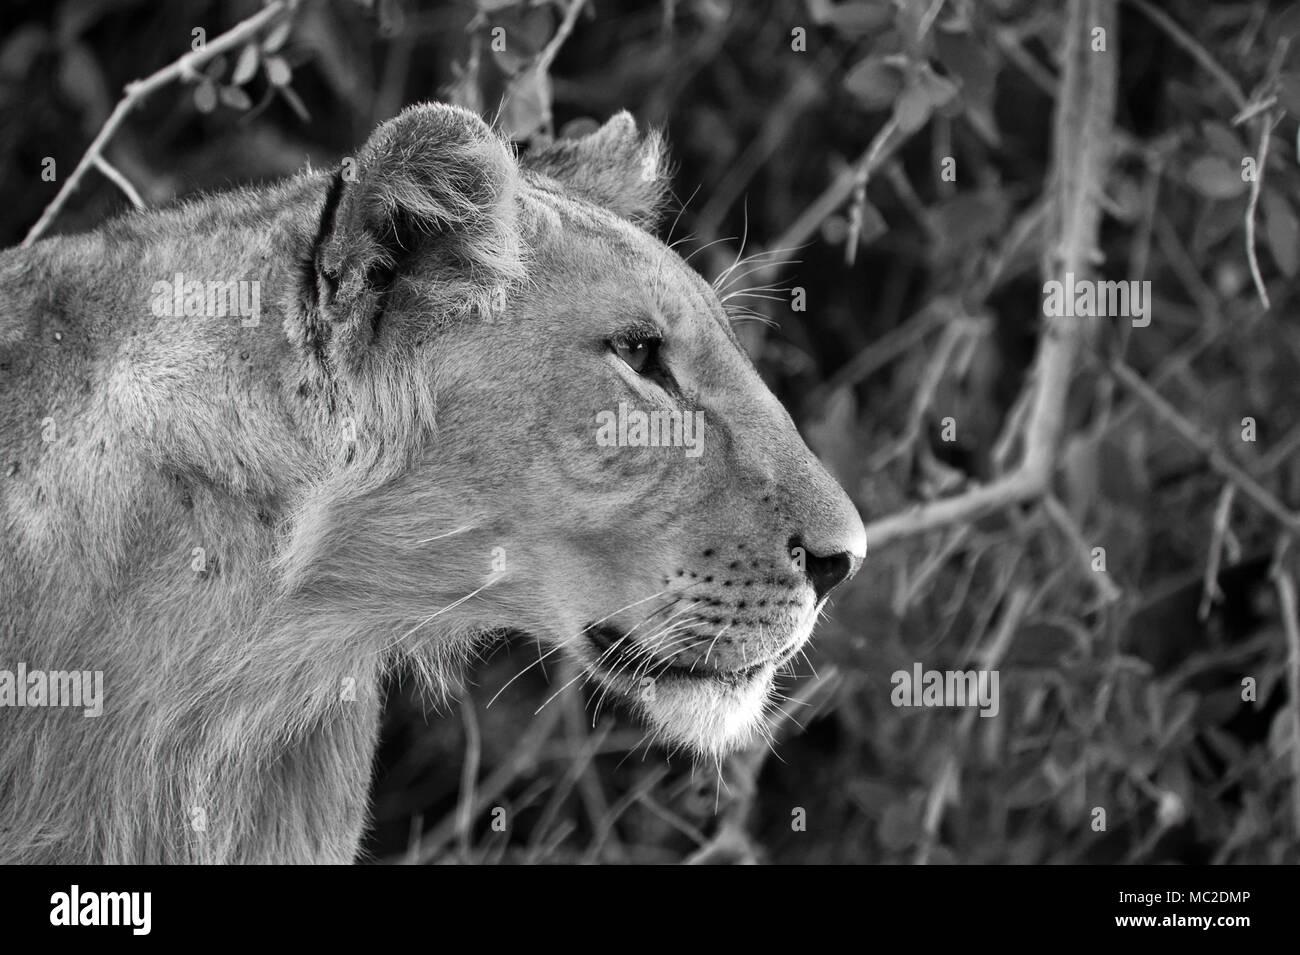 black and white lion portrait stock photos black and white lion